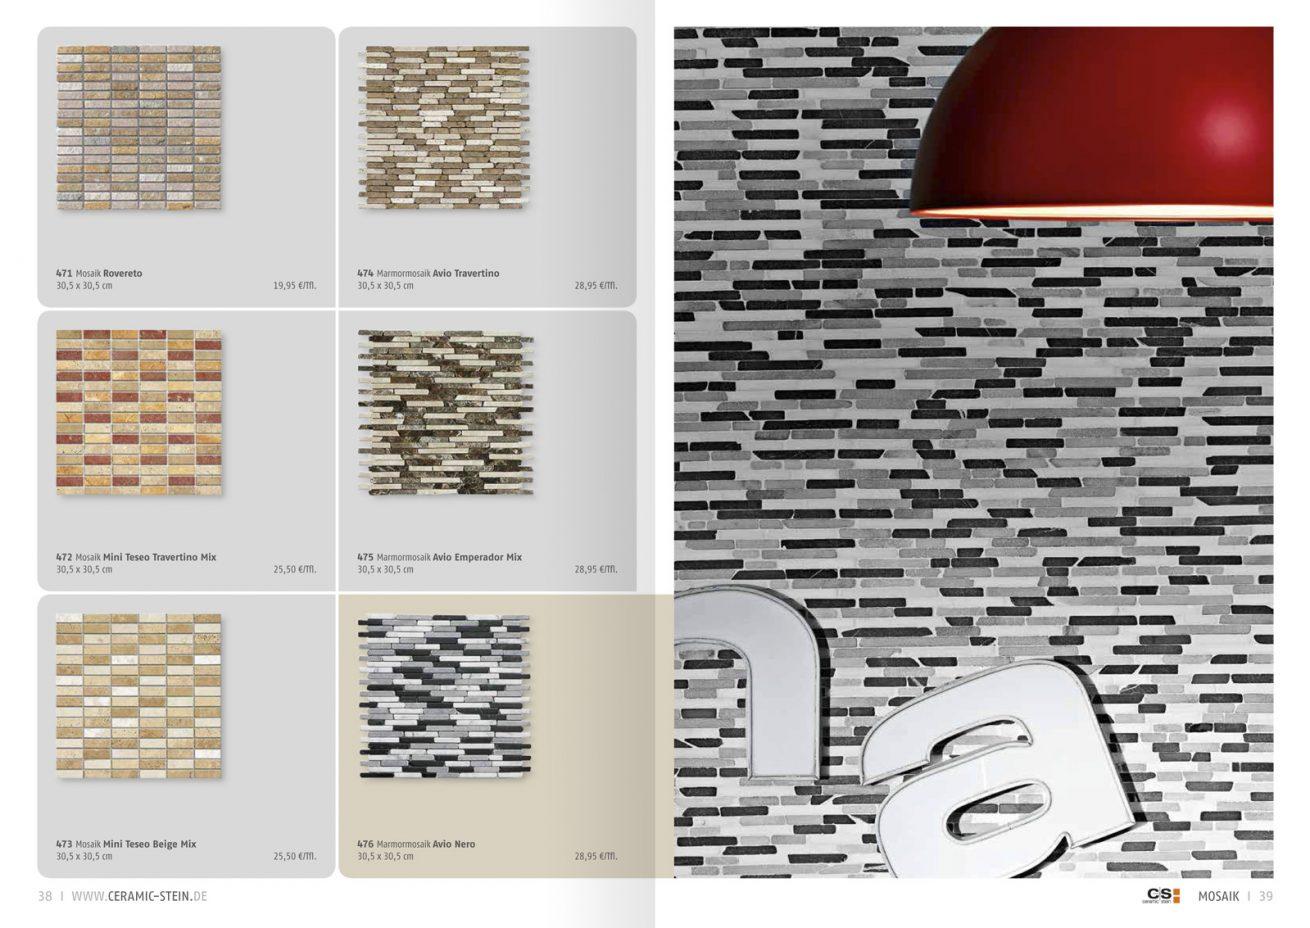 Ceramic + Stein Katalog Wand mit Mosaik